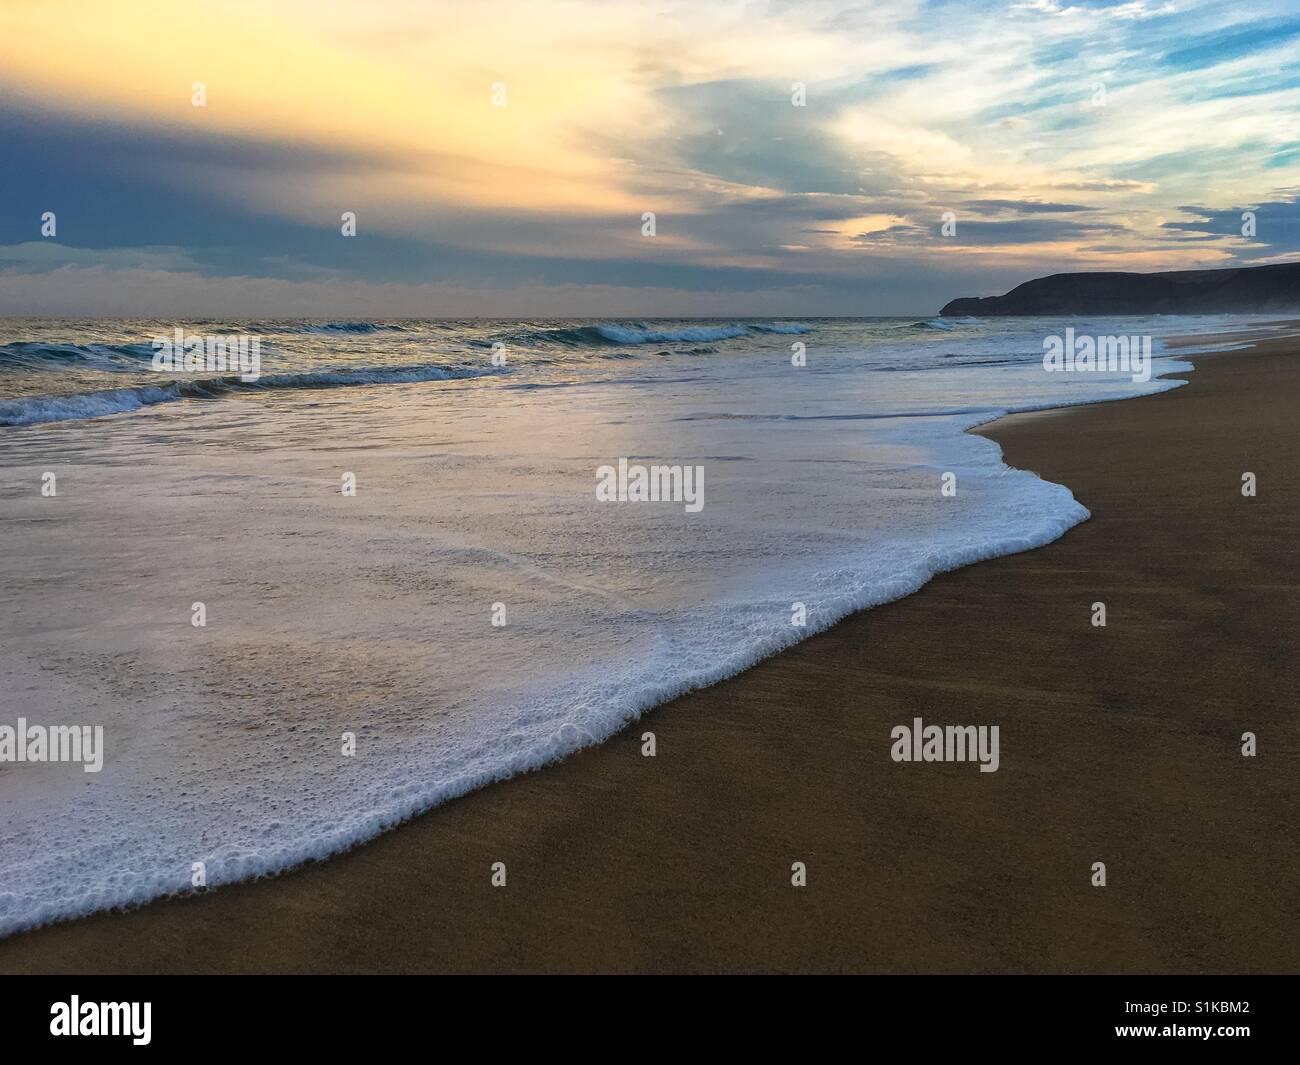 Sunrise on Porto Santo beach, Portugal - Stock Image